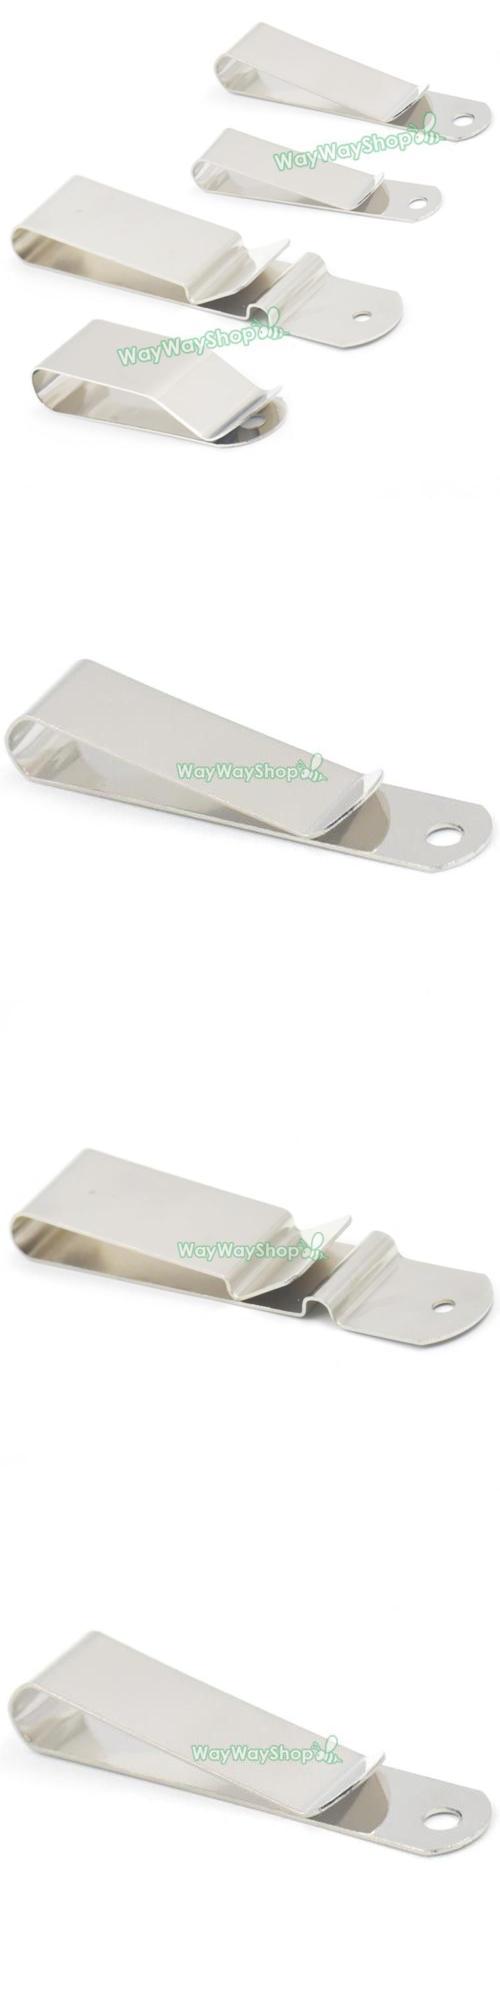 Belt Clip Leather Craft Clasp Spring Holster Hook Buckle Keyring 90 63mm Leather